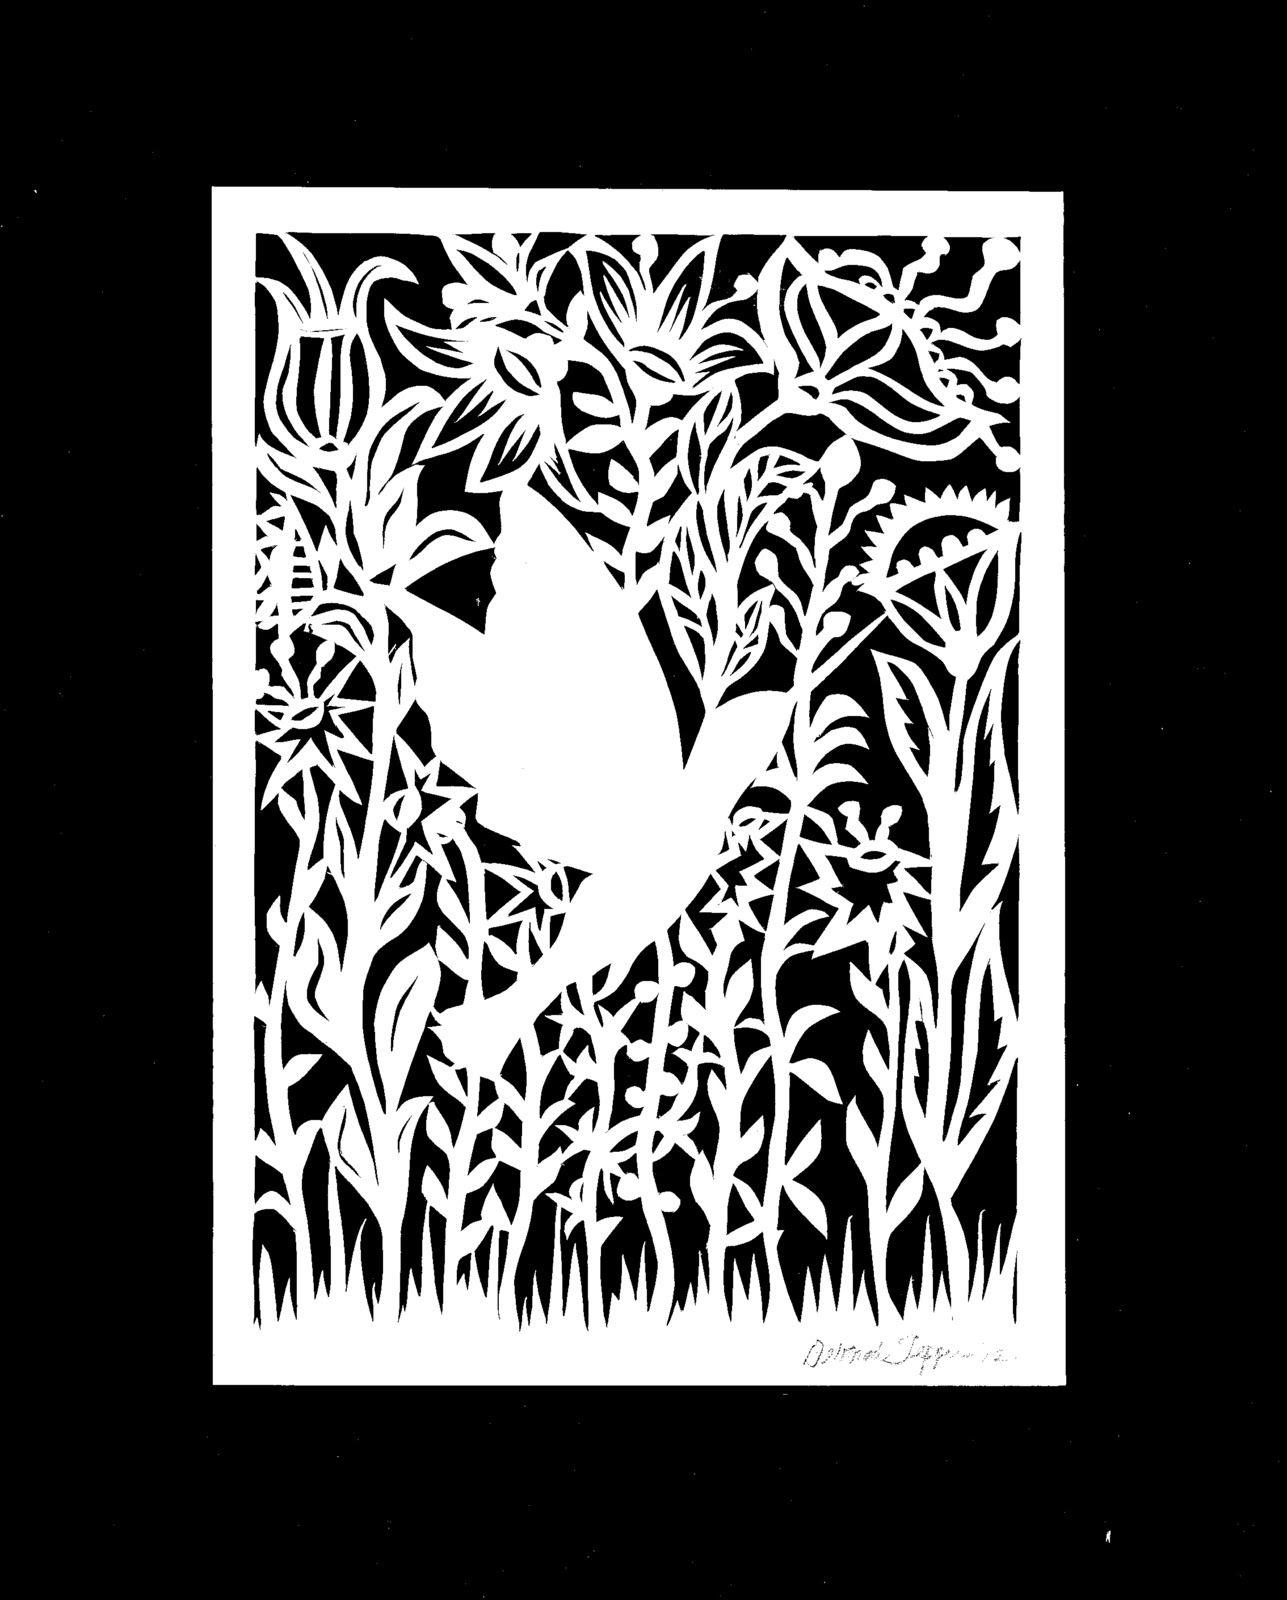 hummingbird0001.tif 1 287 × 1 600 pixels | Kirigami | Pinterest